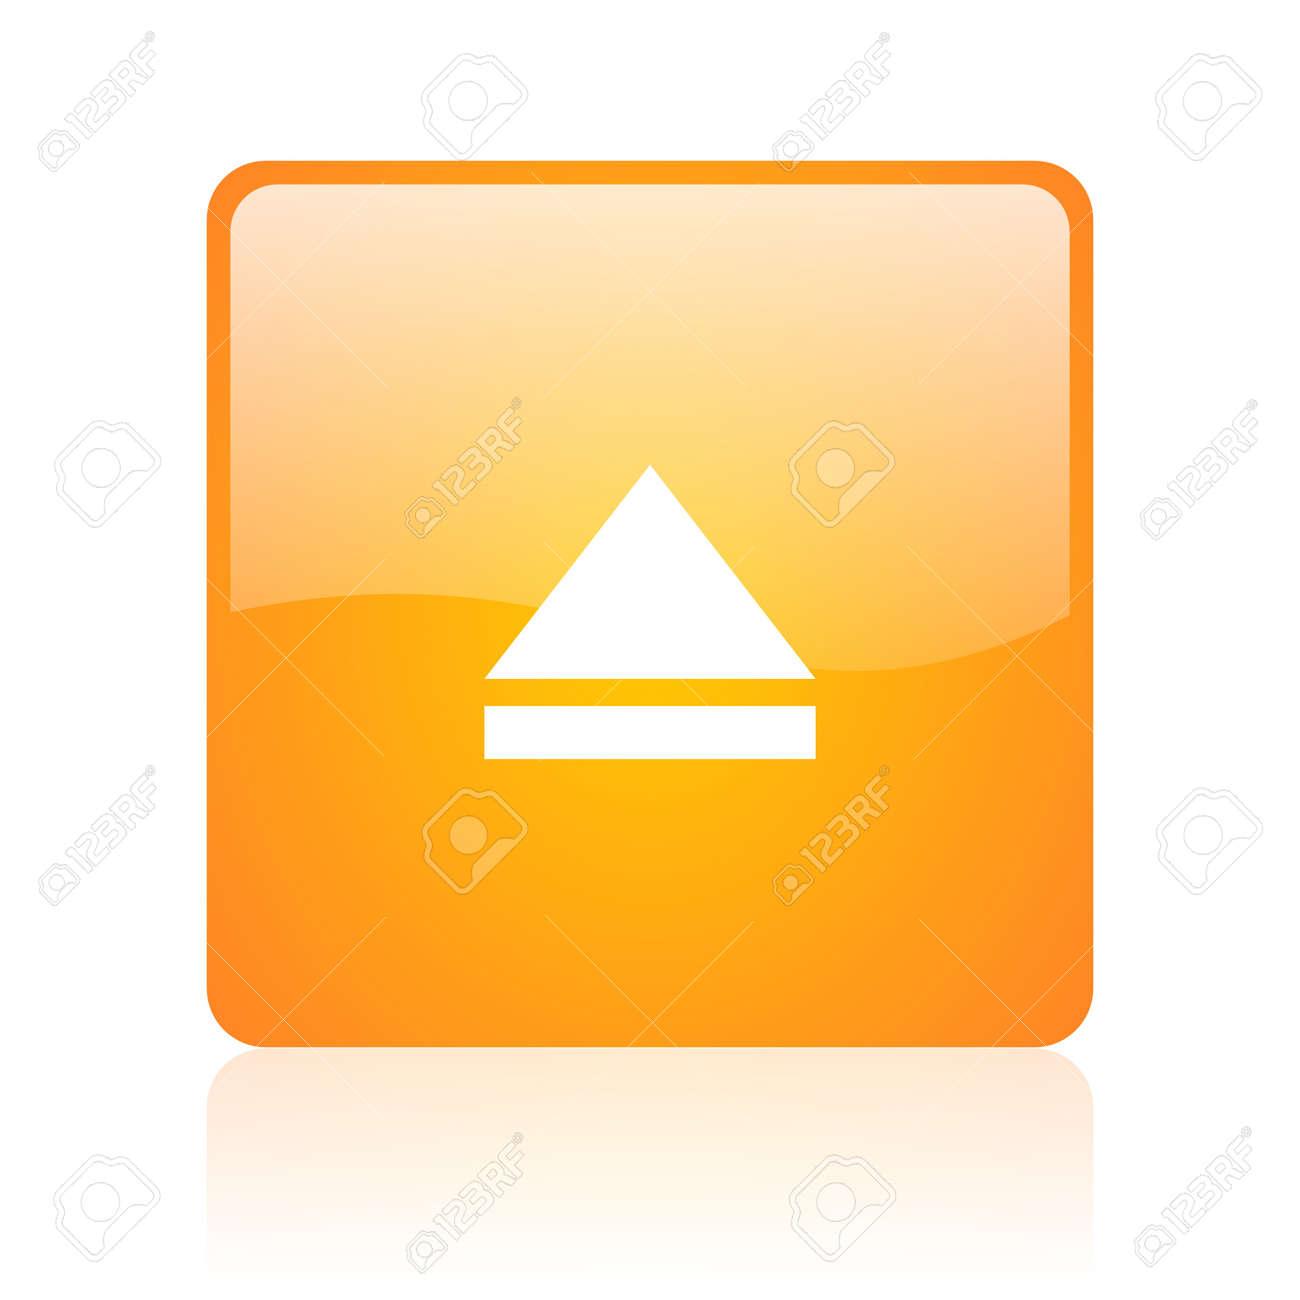 eject orange square glossy web icon Stock Photo - 18360677